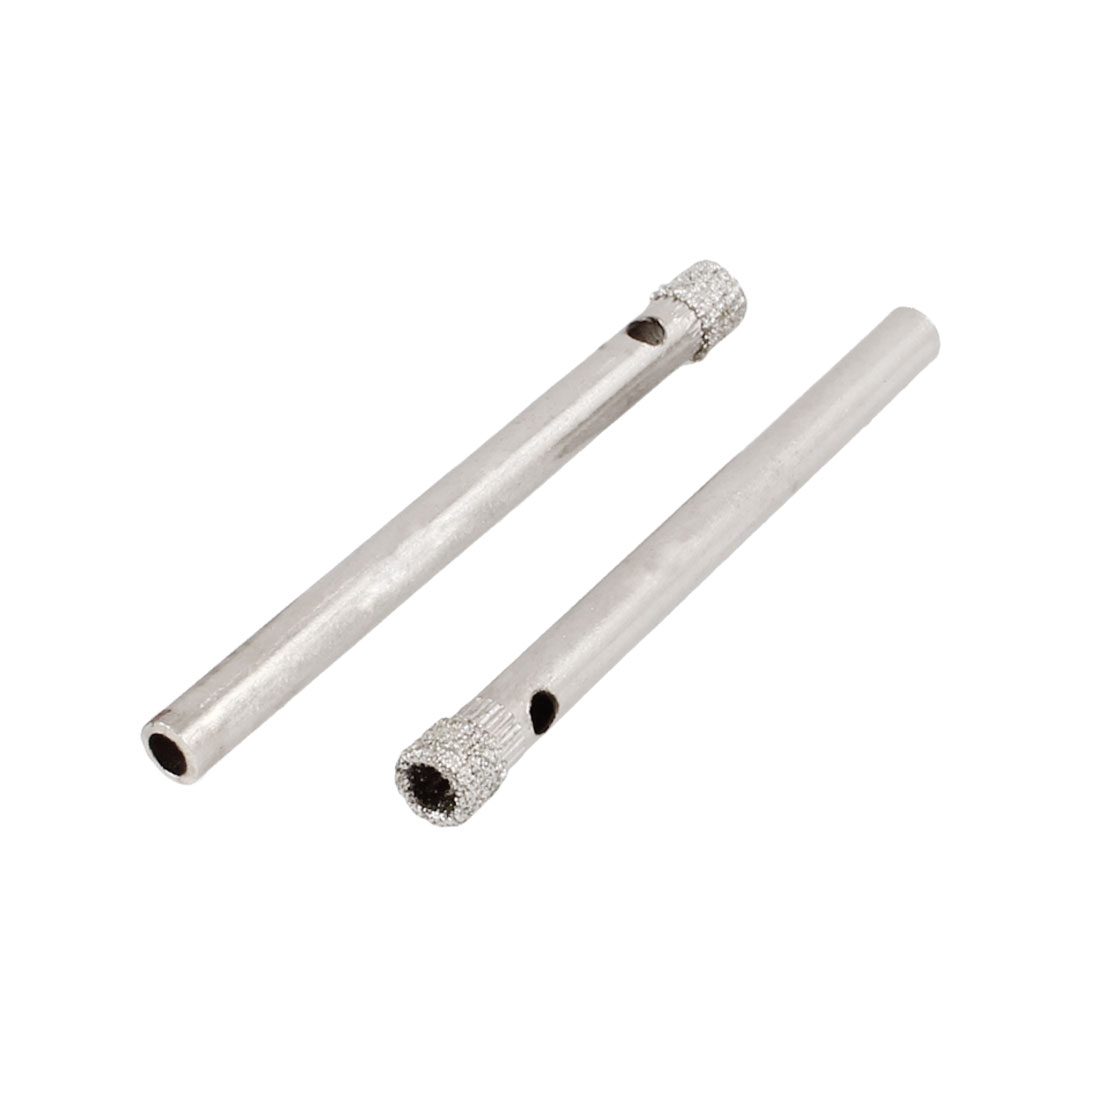 "Diamond Tool Drill Bit Ceramic Tile Glass Hole Saw 4mm 5/32"" 2 Pcs"